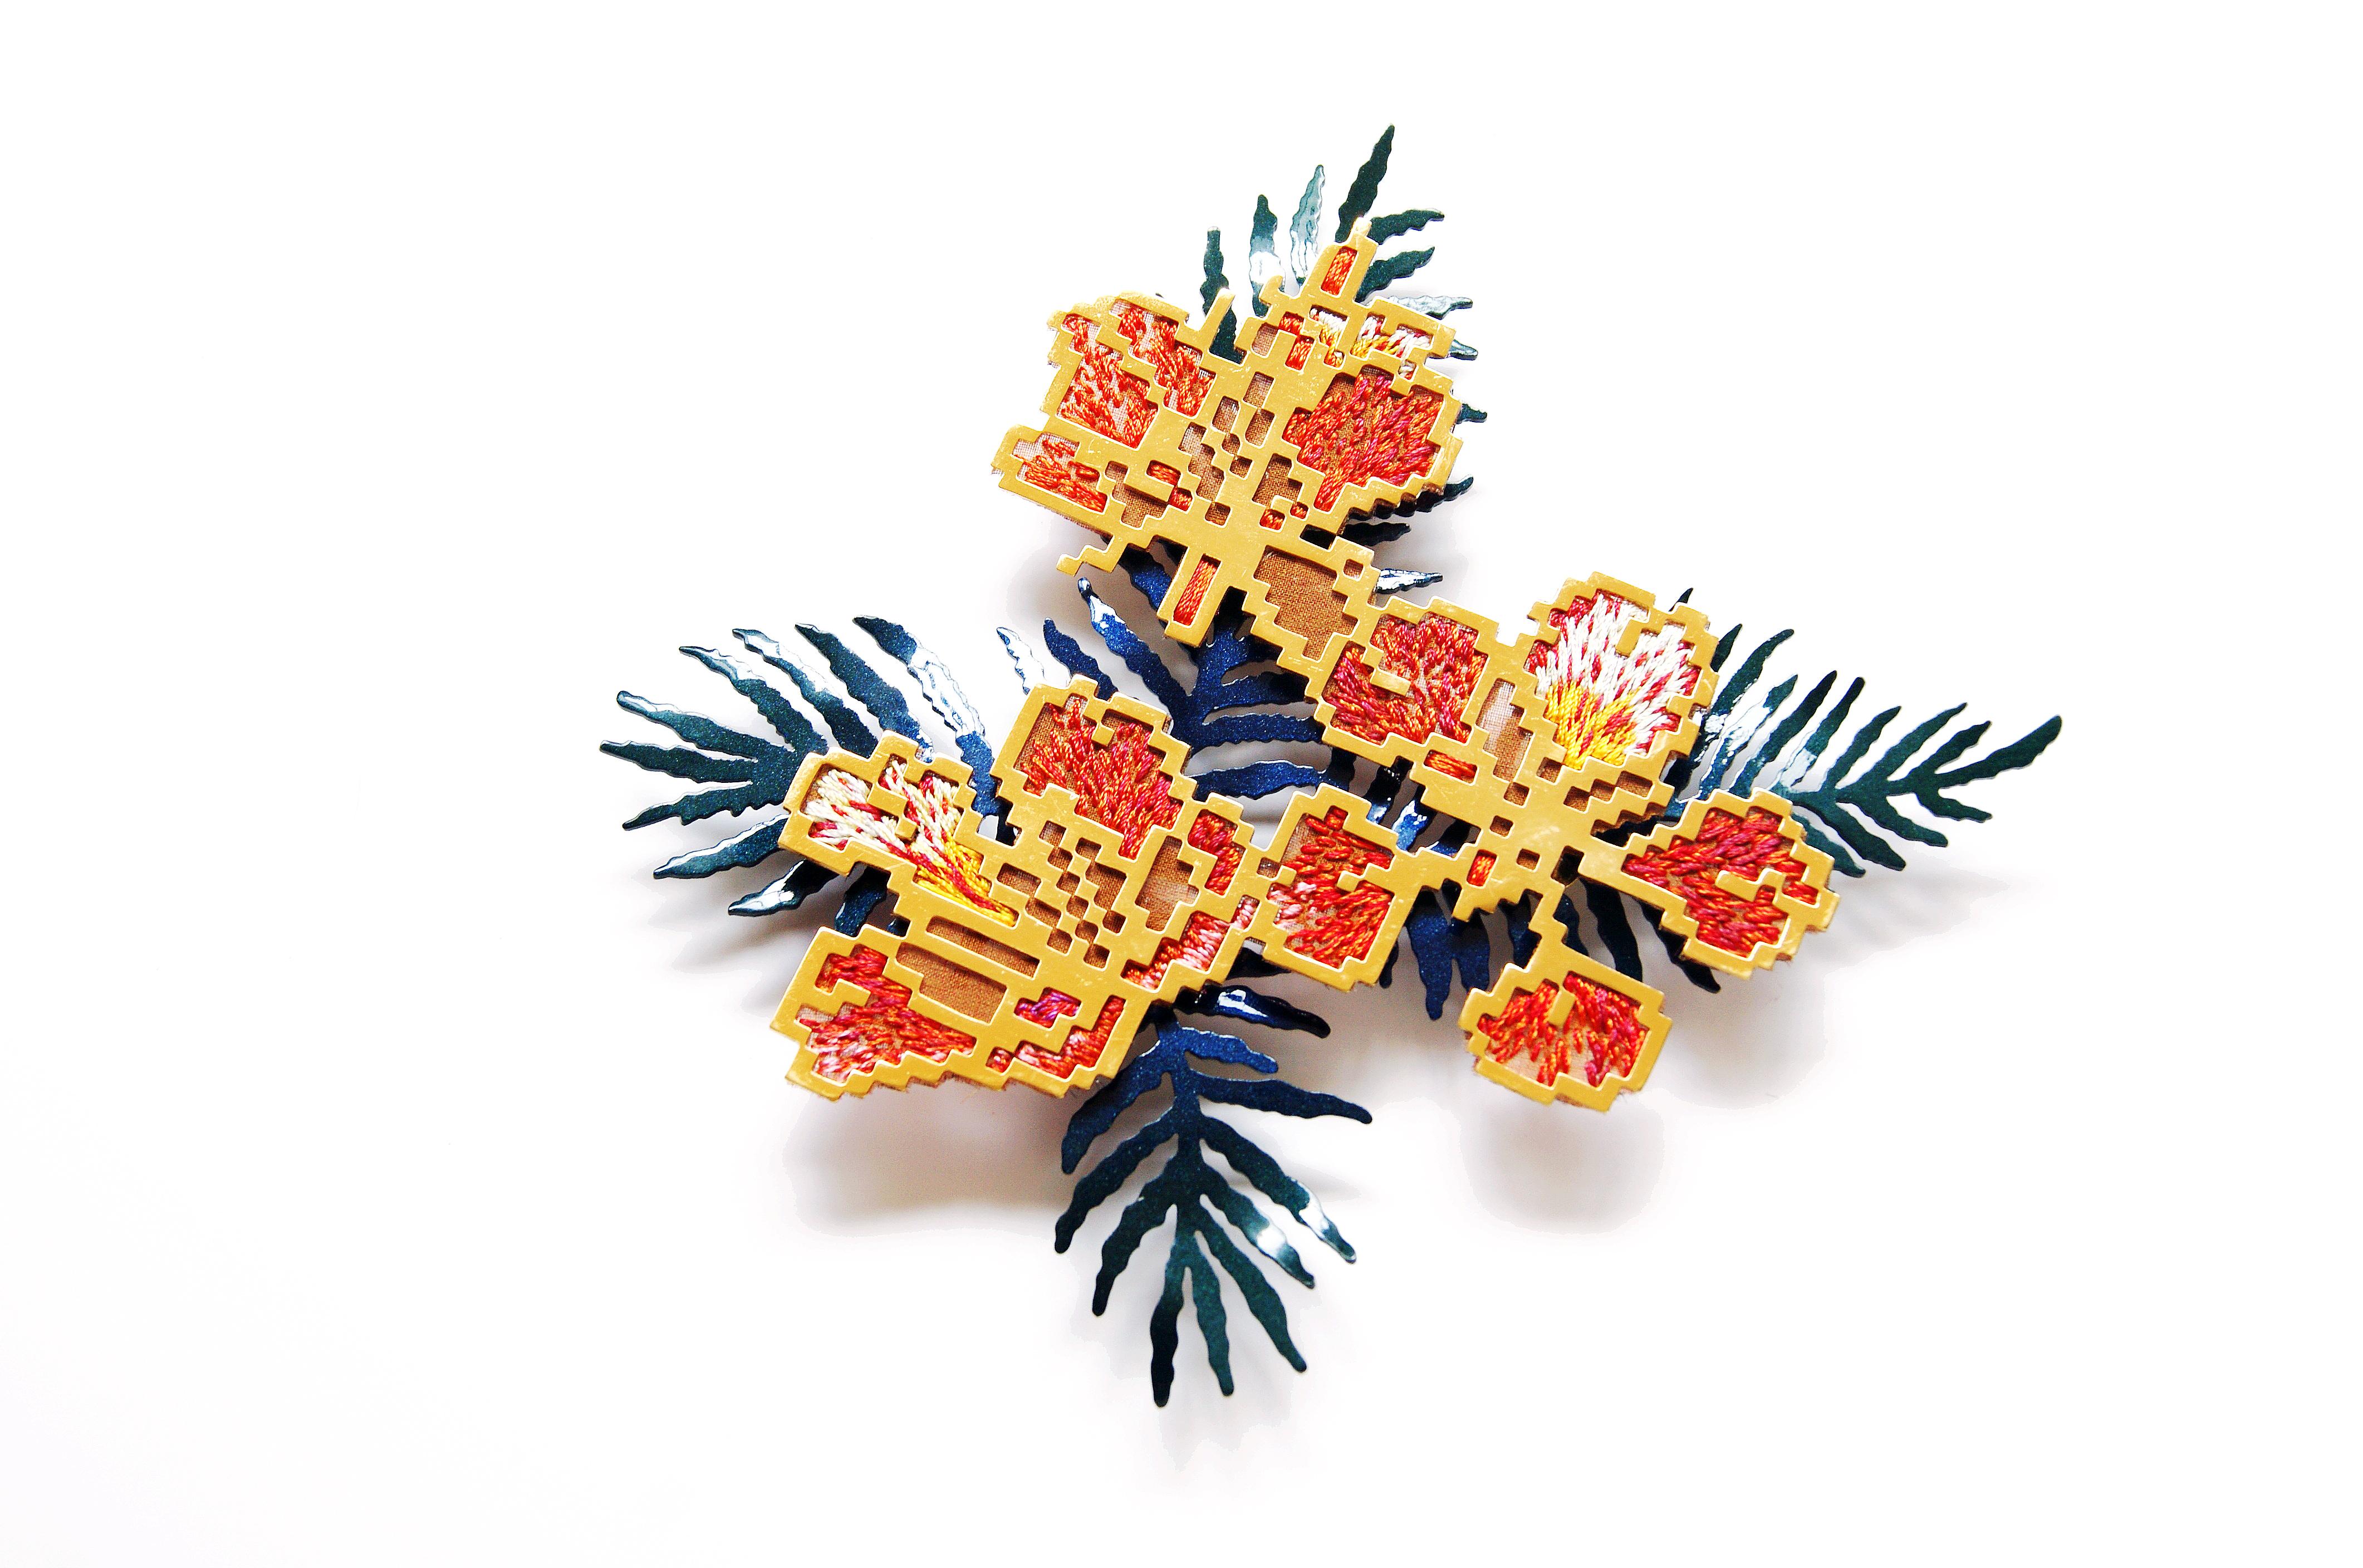 島嶼映花-鳳凰花Floral Print of Formosa- Hen